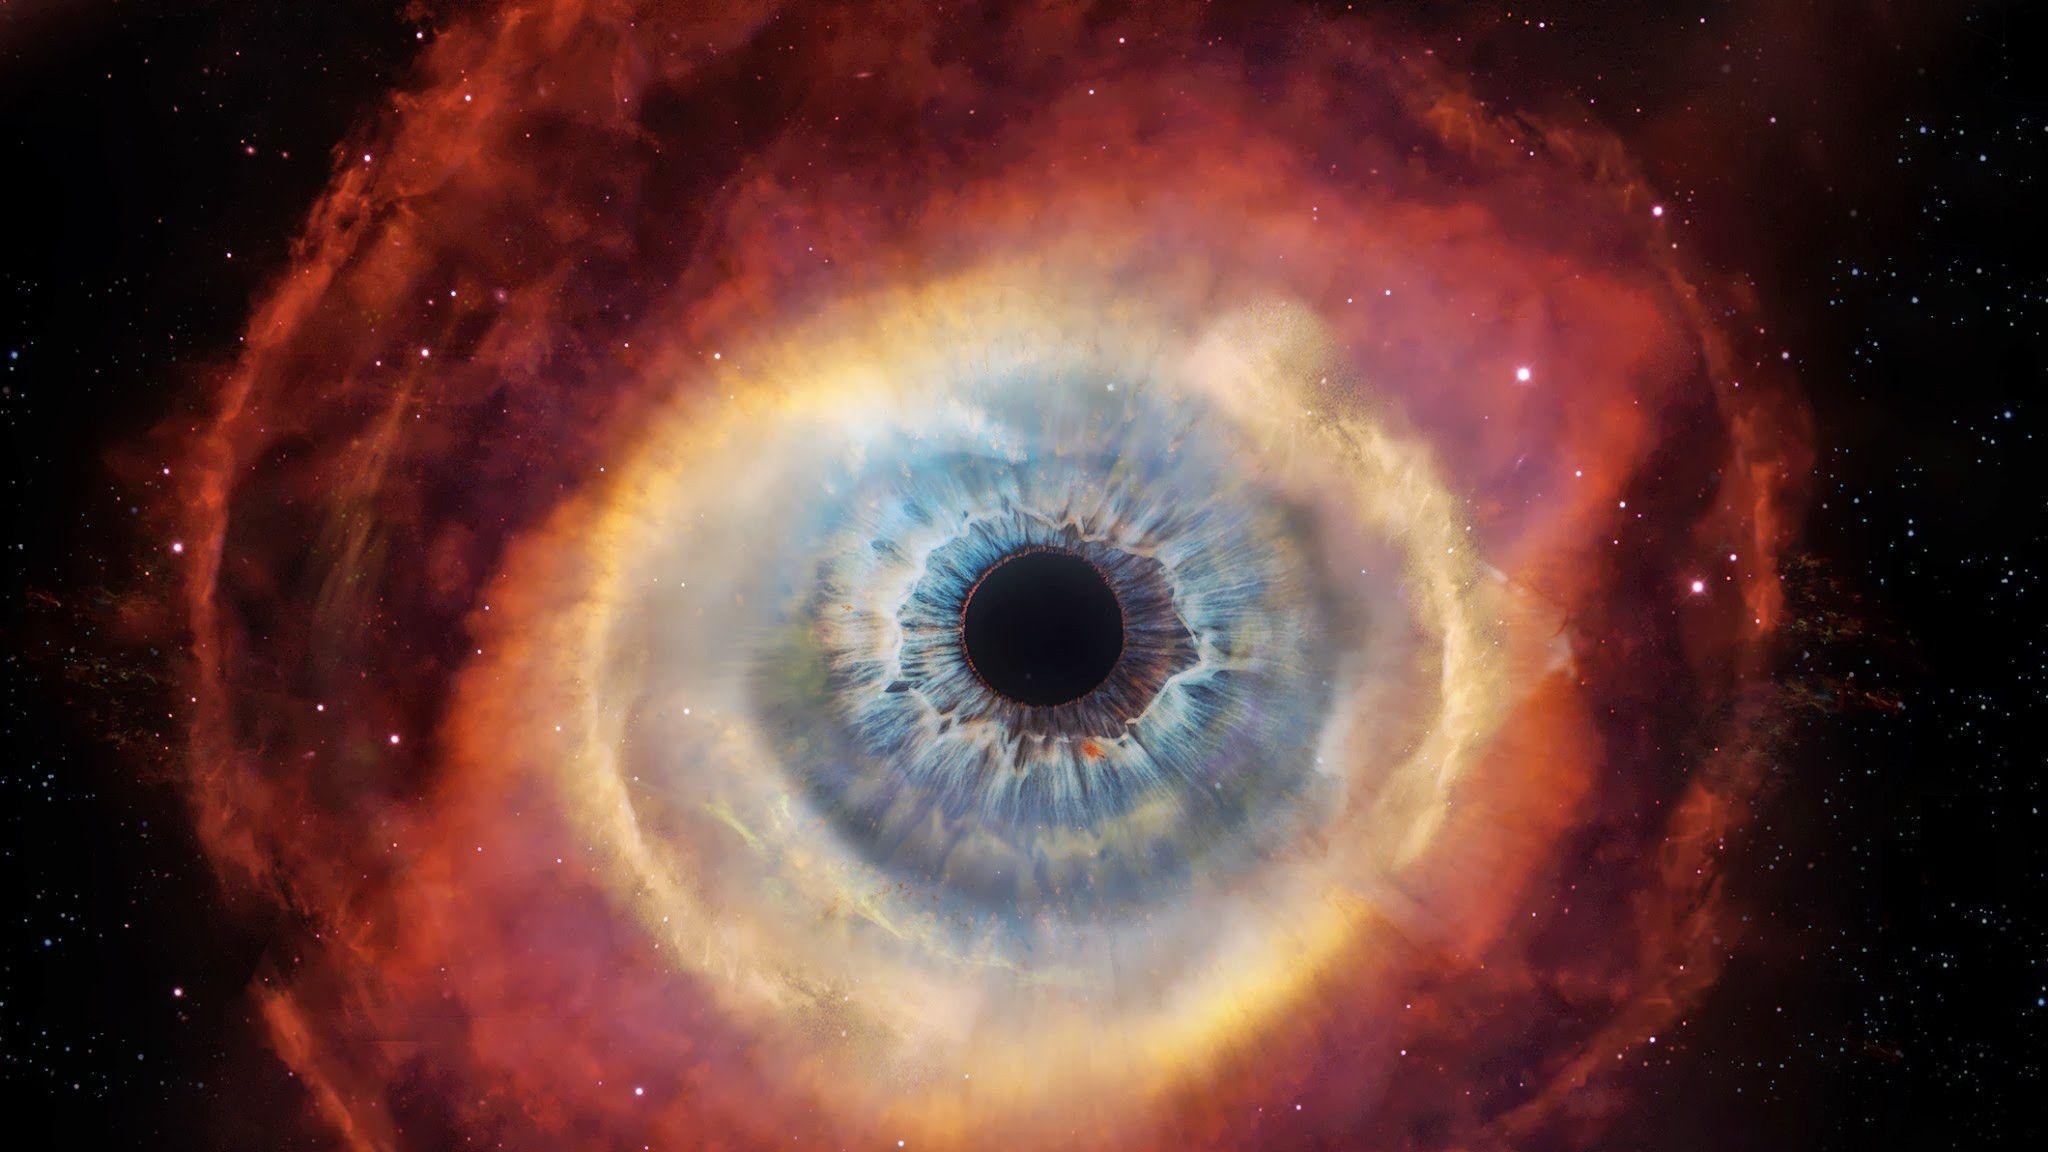 Cat's Eye Nebula Wallpaper Phone for Desktop 2048x1152 px